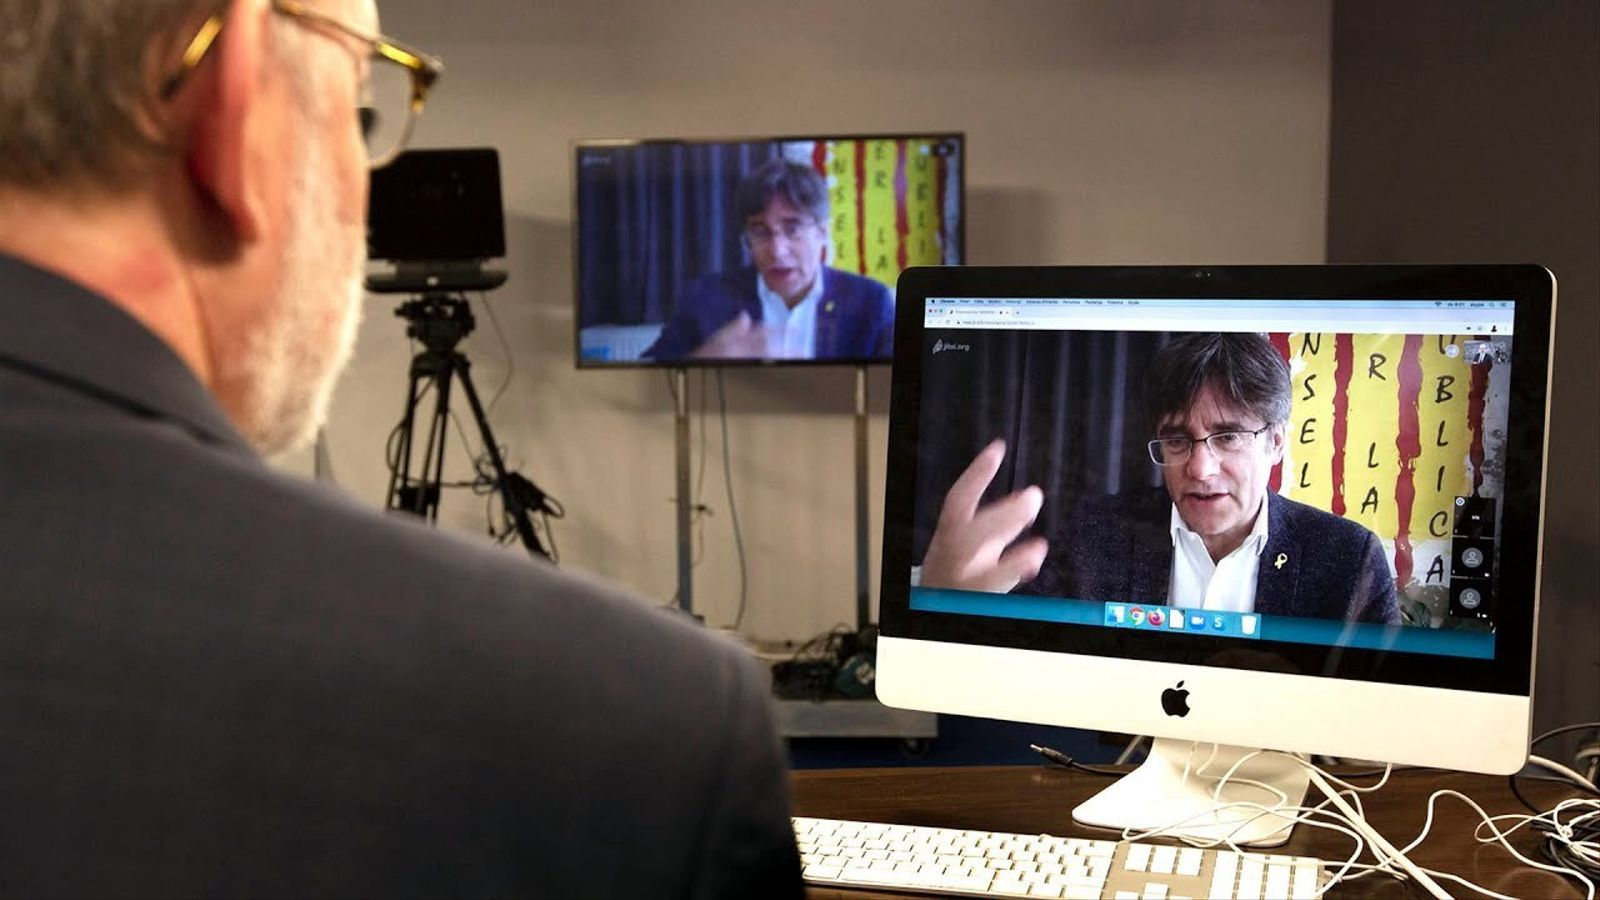 Entrevista d'Antoni Bassas a Carles Puigdemont